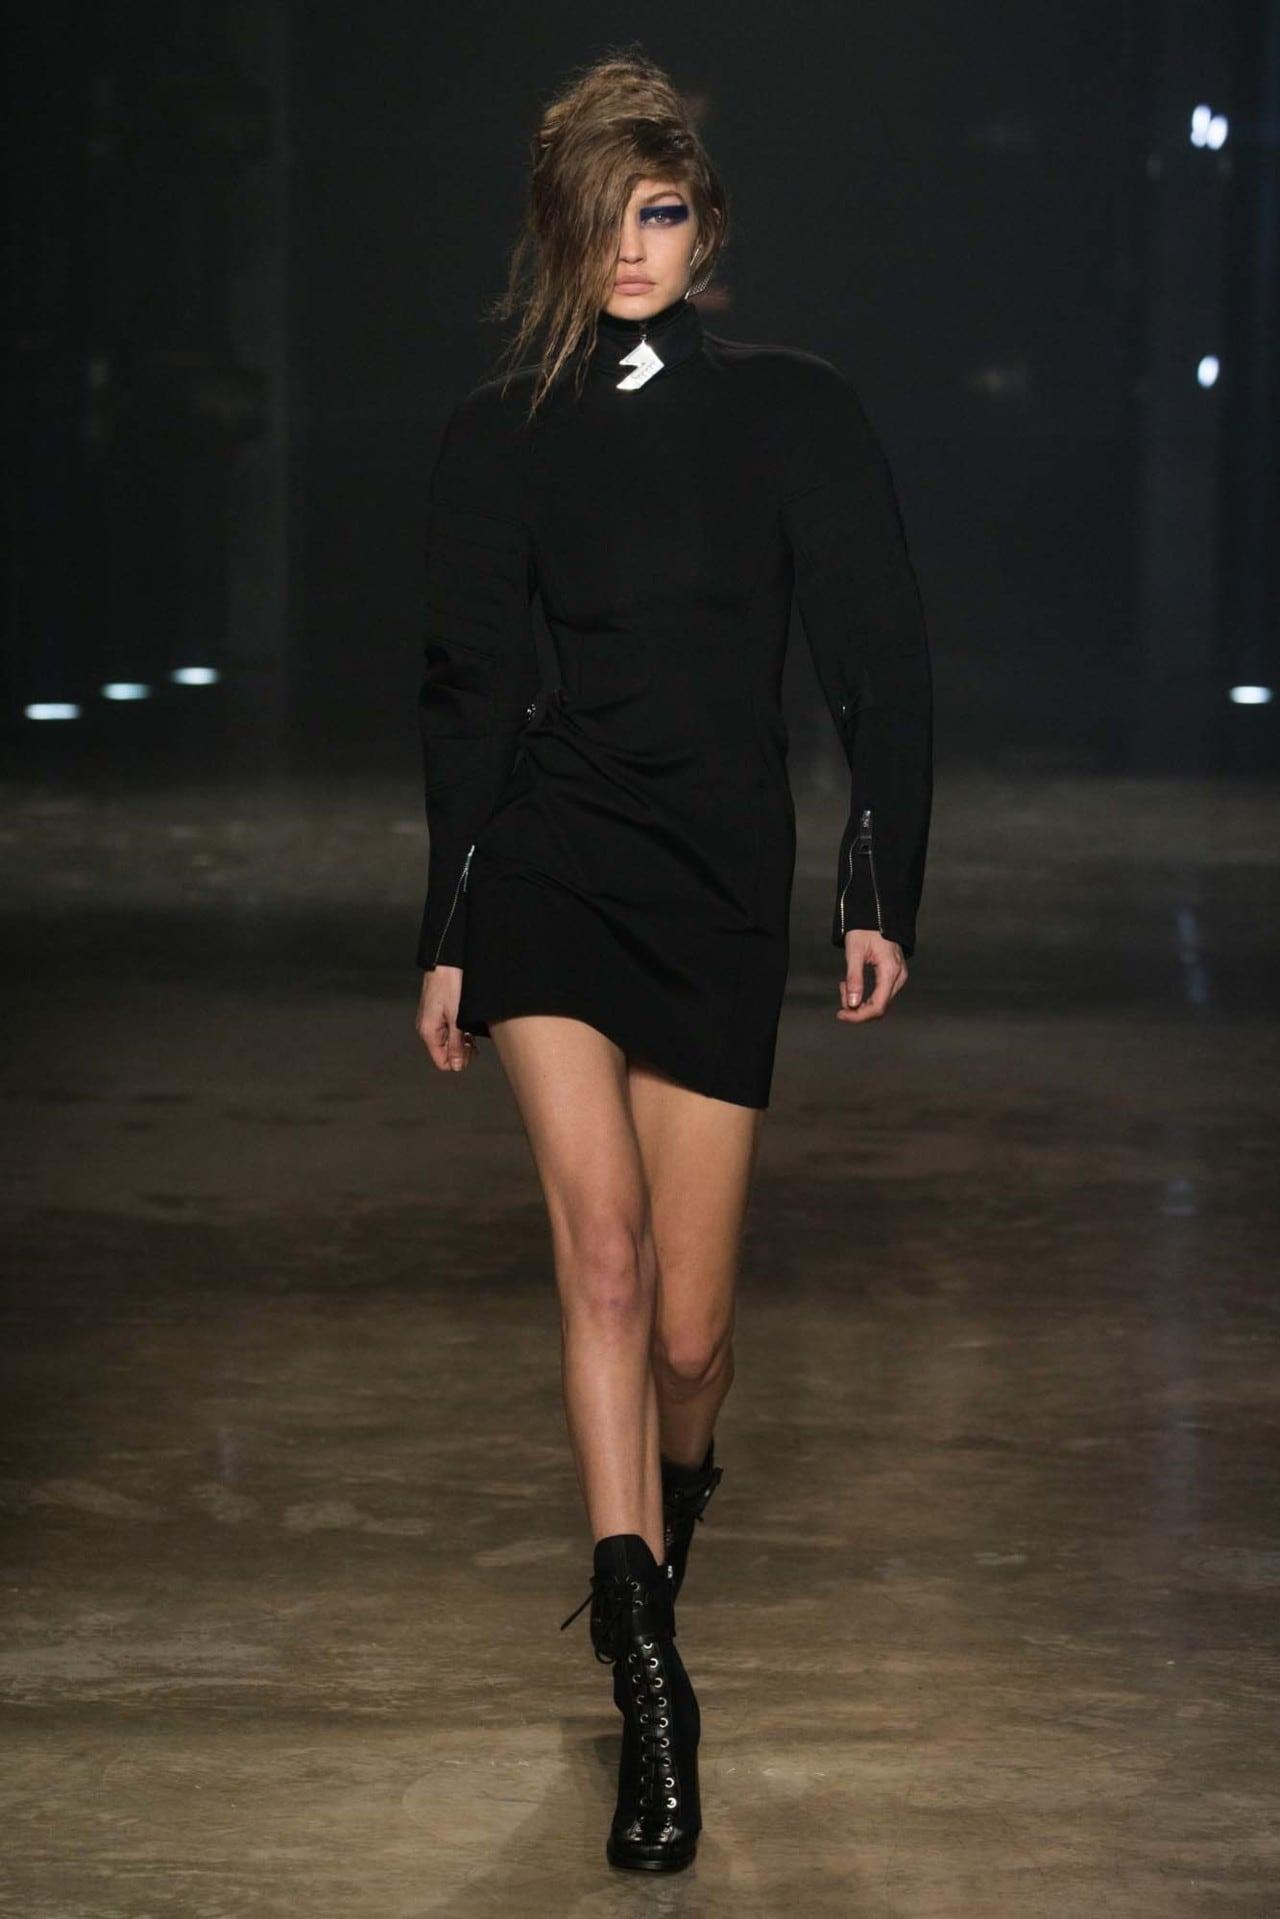 Versus Versace ready-to-wear autumn/winter '17/'18